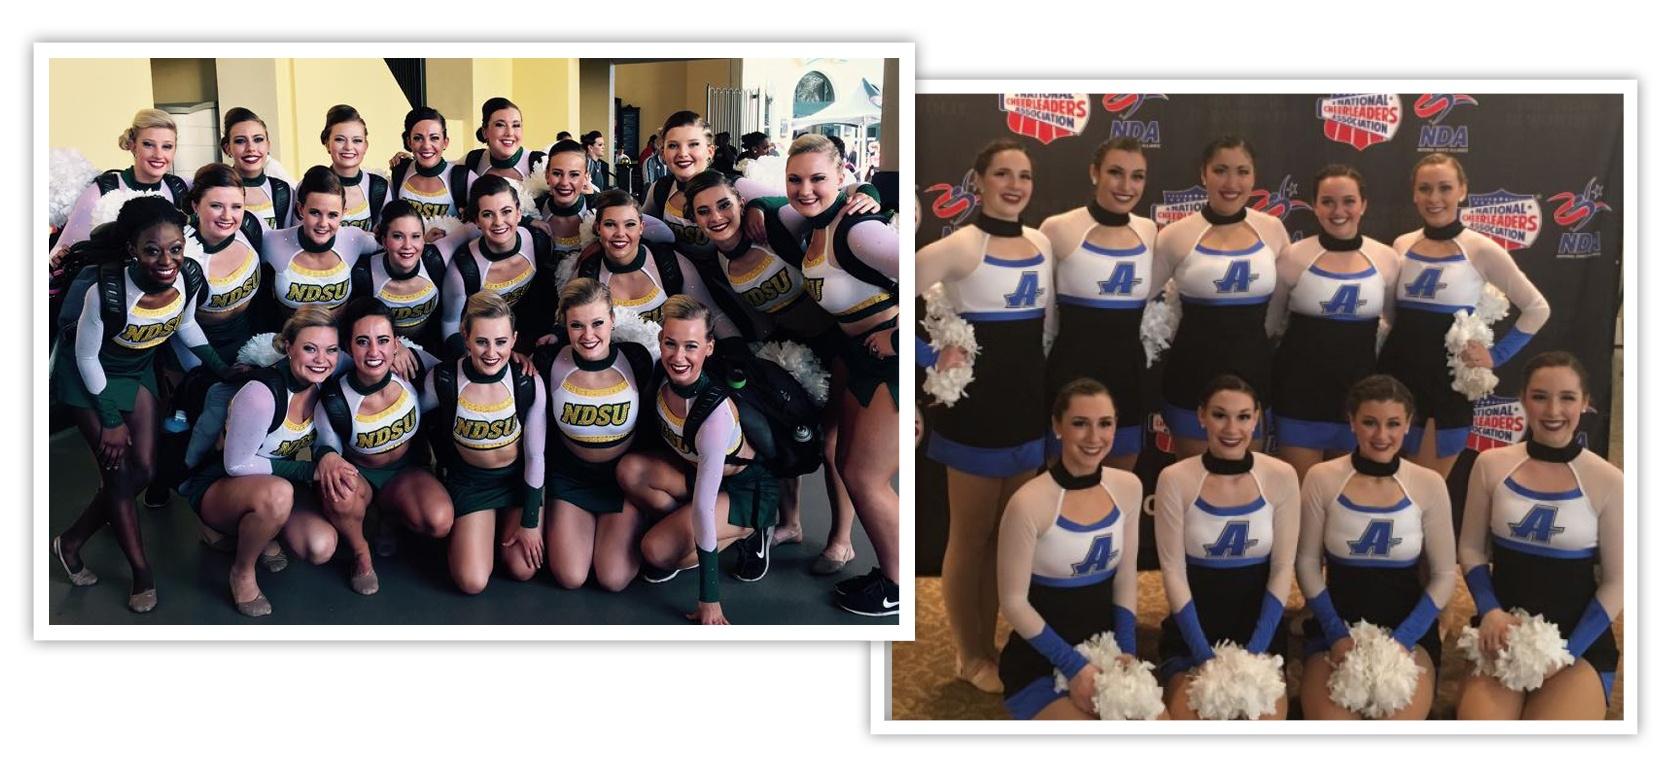 cheer and pom uniform trends: choker look